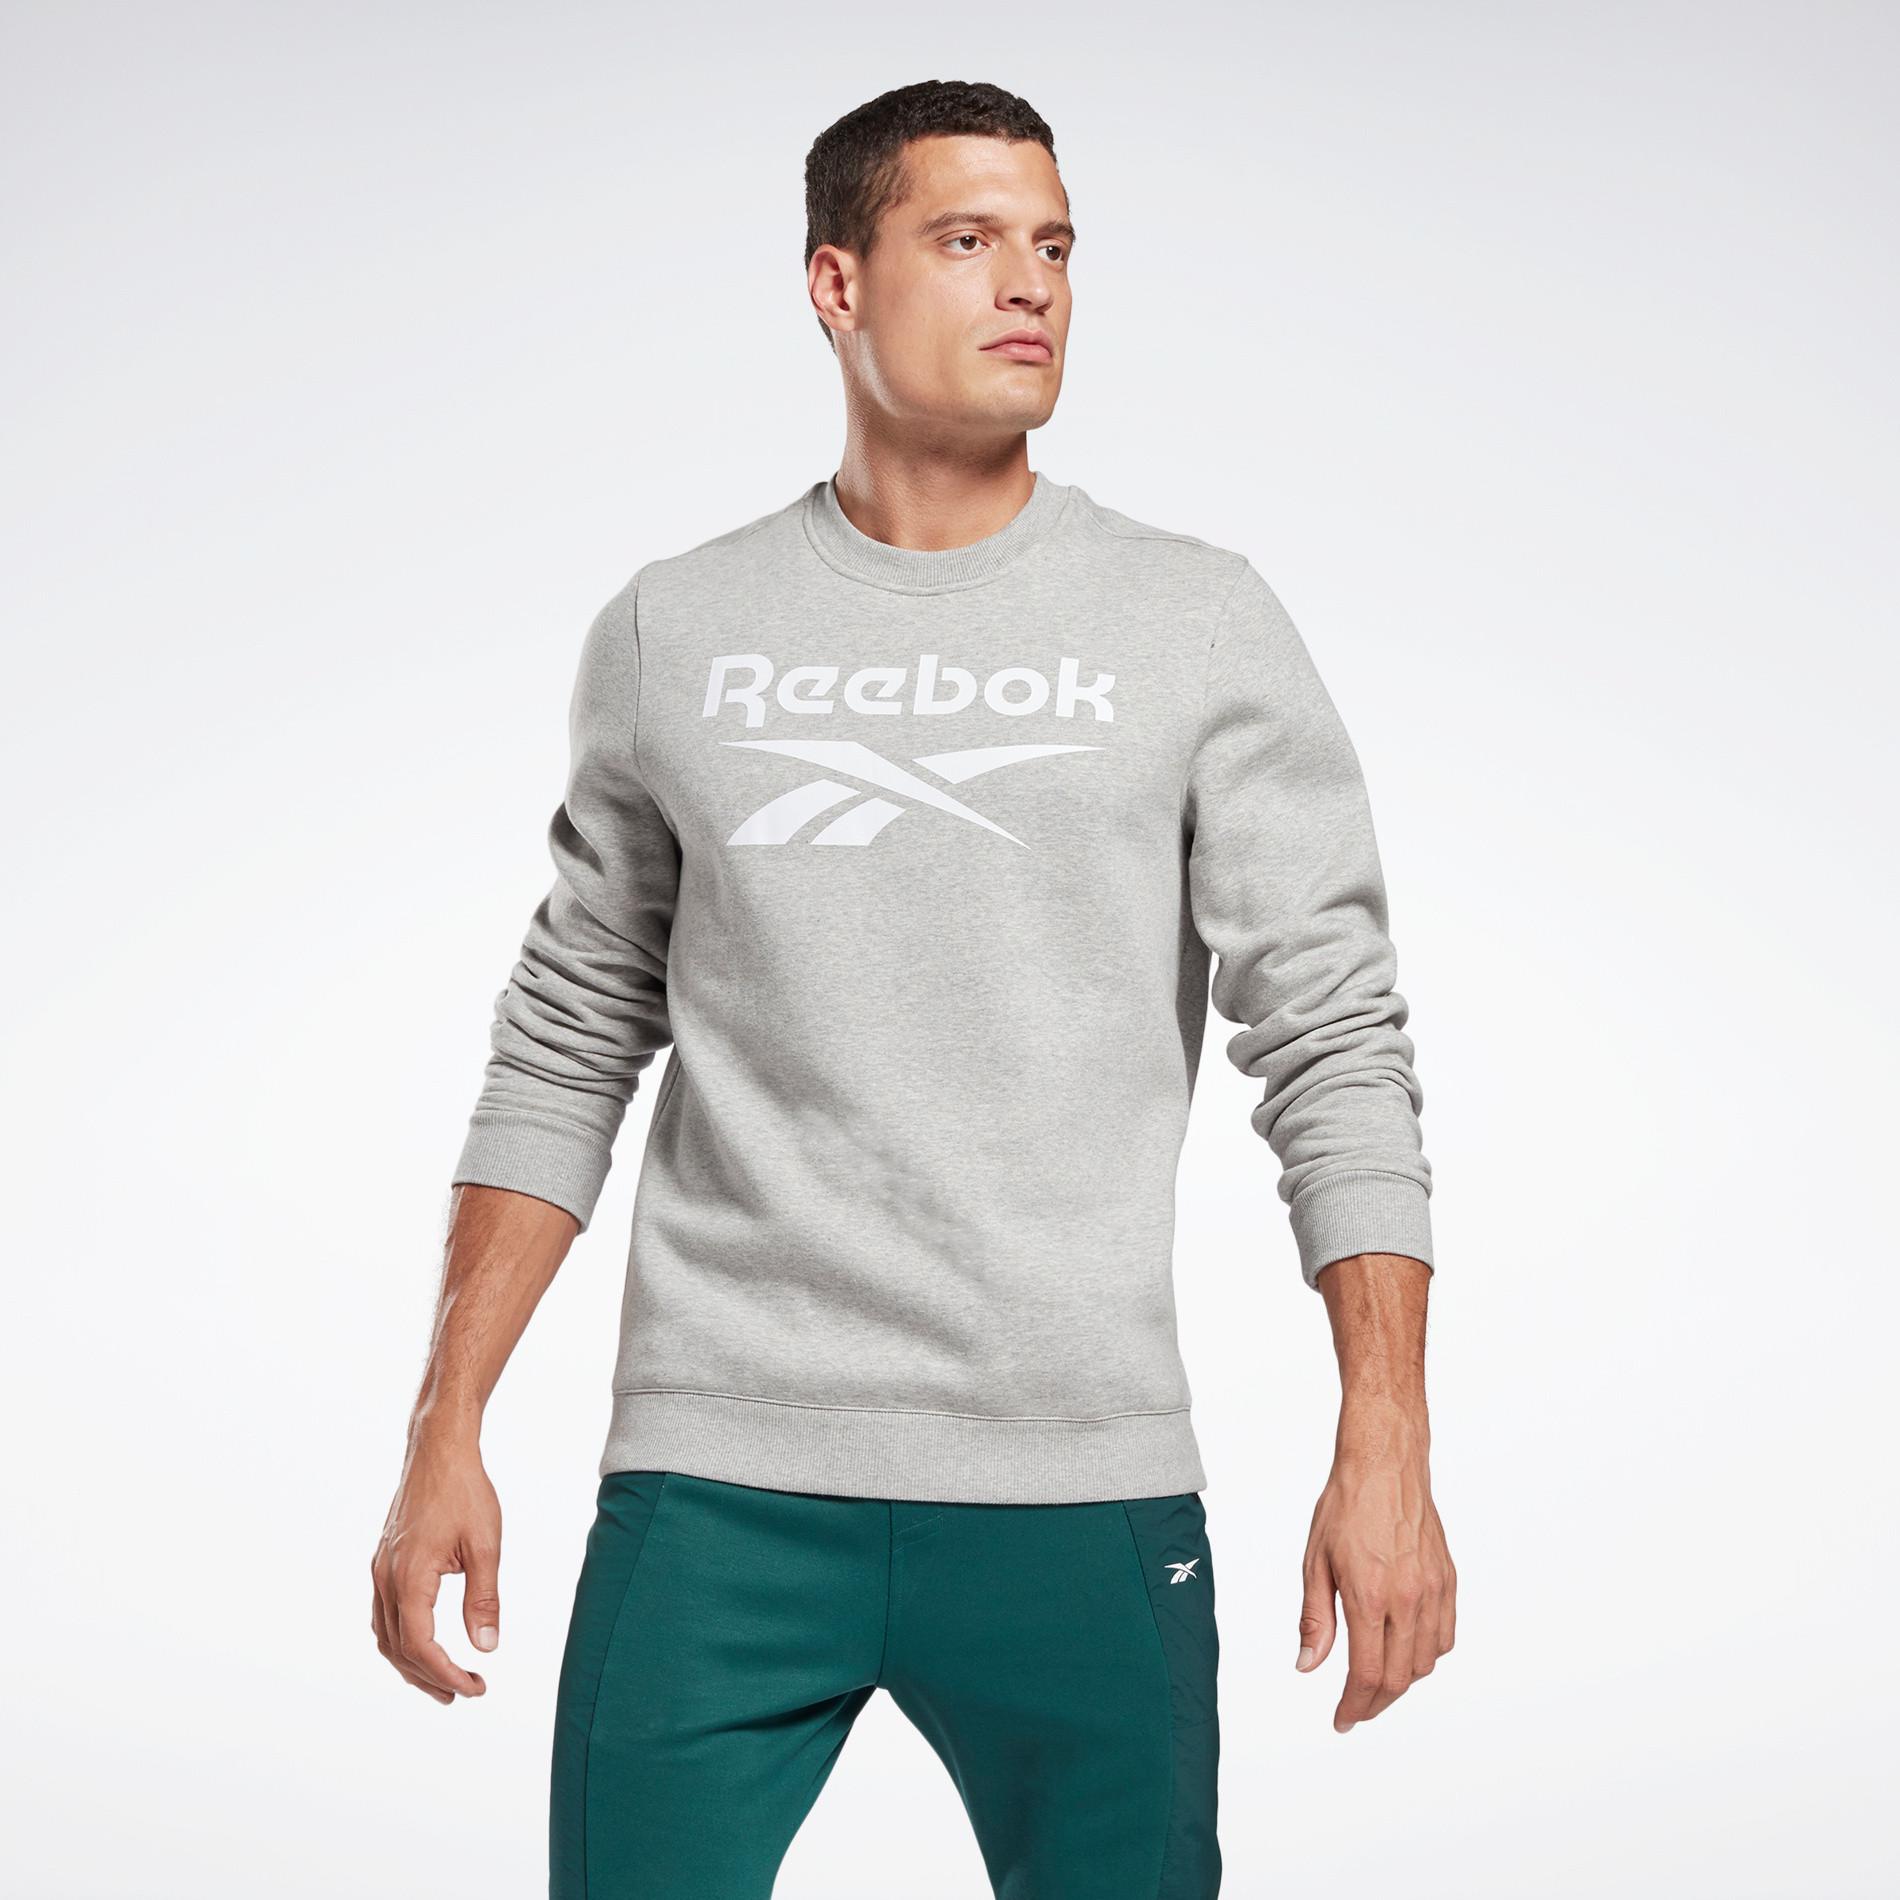 Felpa girocollo Reebok identity fleece, Grigio, large image number 1